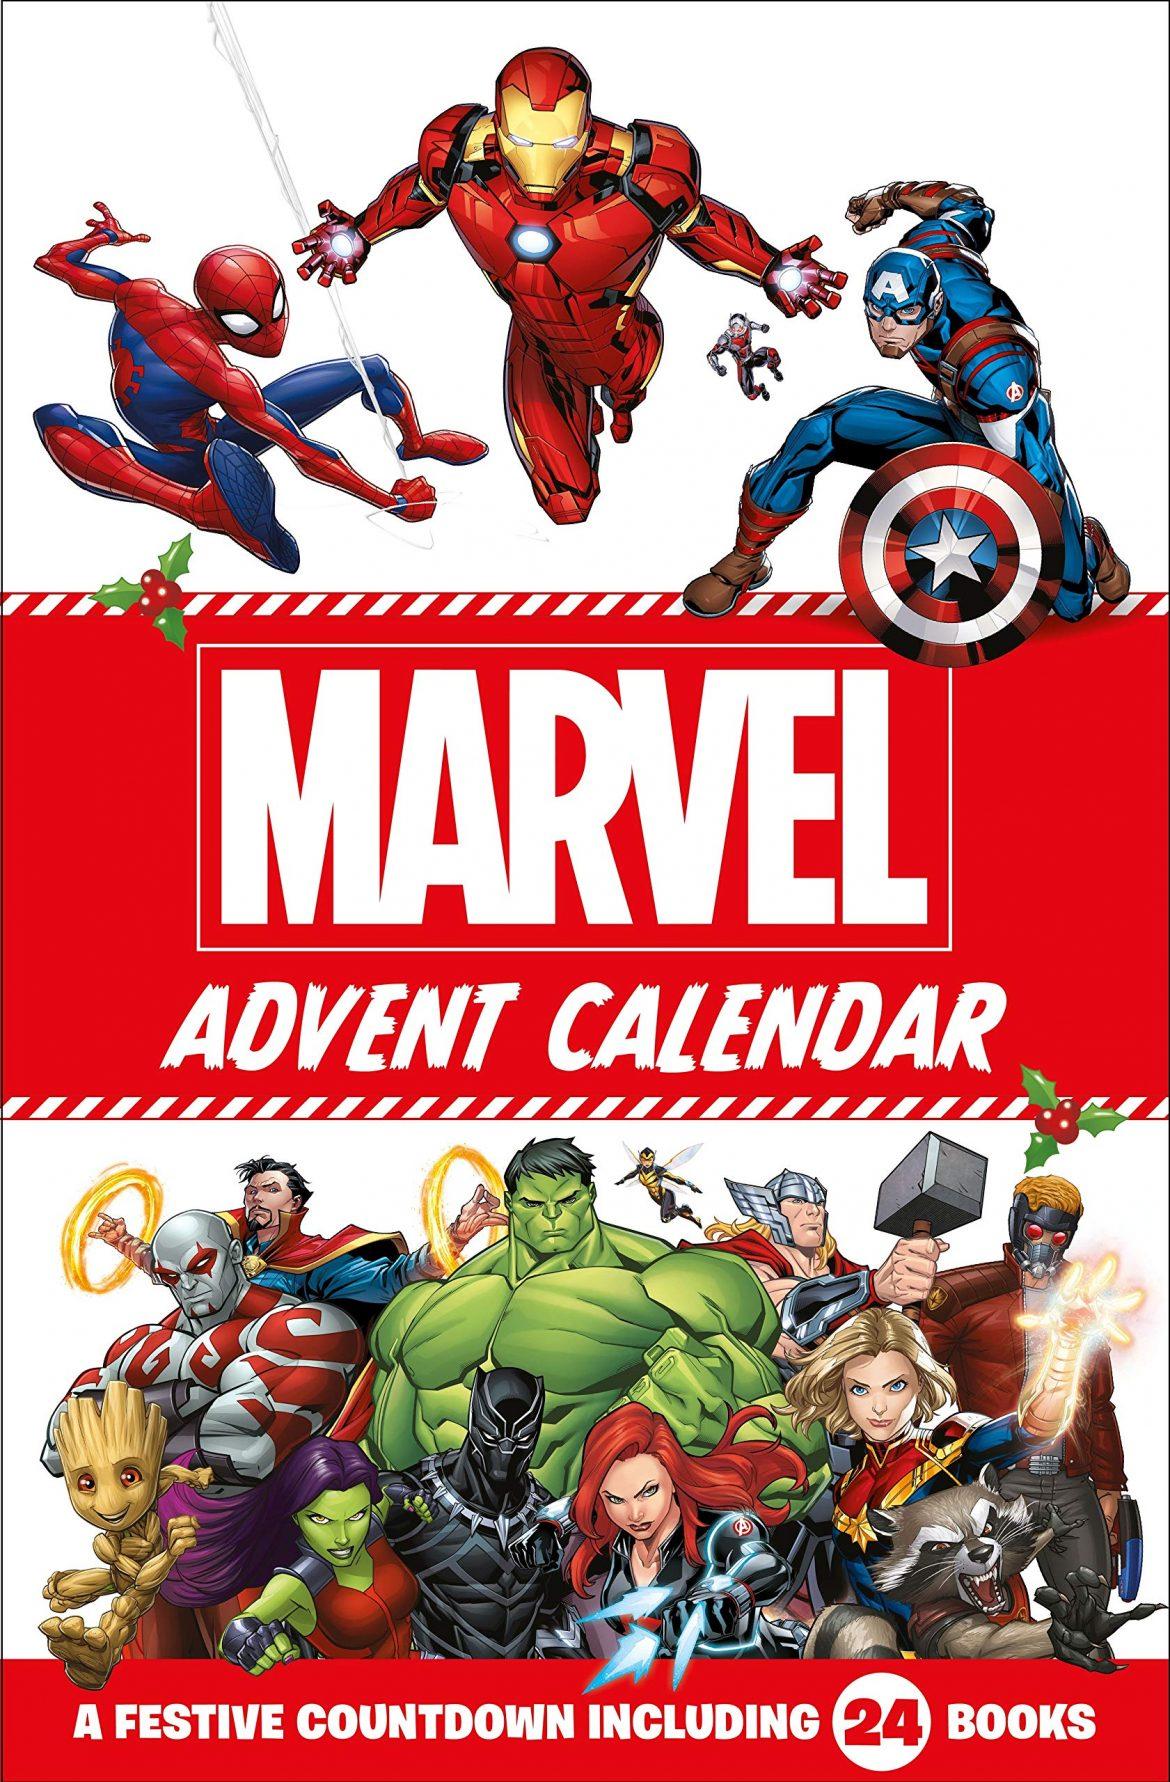 【Amazon】Advent Calendar 2020 - 兒童聖誕禮物篇